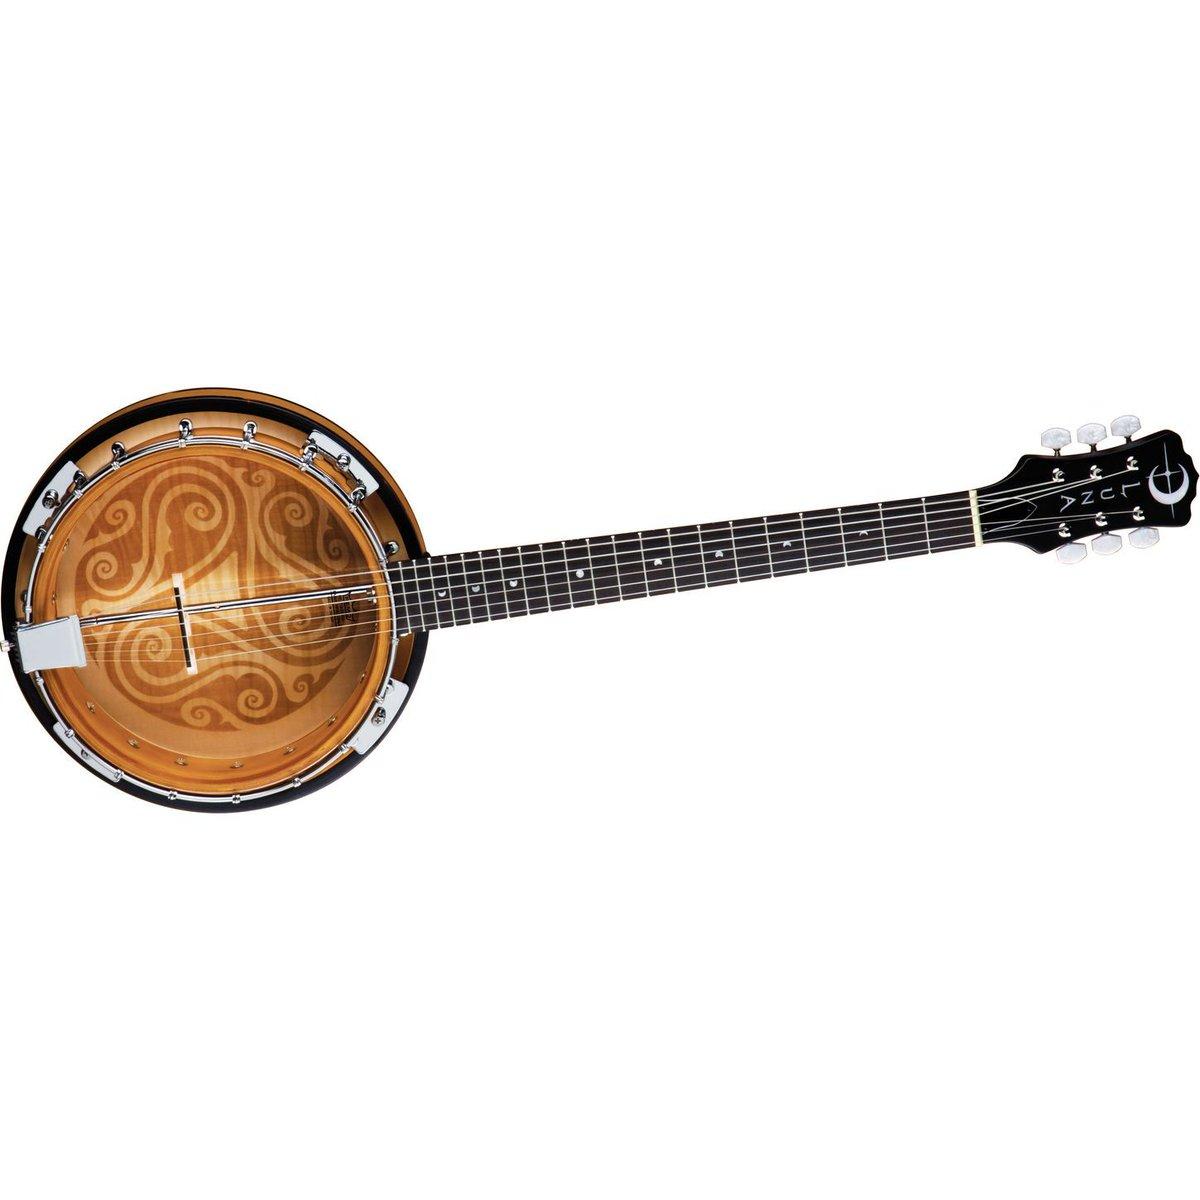 Luna Celtic 6-String Banjo  Shop now at http://bit.ly/LunaCelt6  #banjo #bluegrass #countrycurrent #fiddle #mandolin #celticgrass #irishmusic #bluegrassunderground #Americana #folk #country #jamband #celtic #JohnLennon #SundayMotivationpic.twitter.com/UyL6Ckq5q9